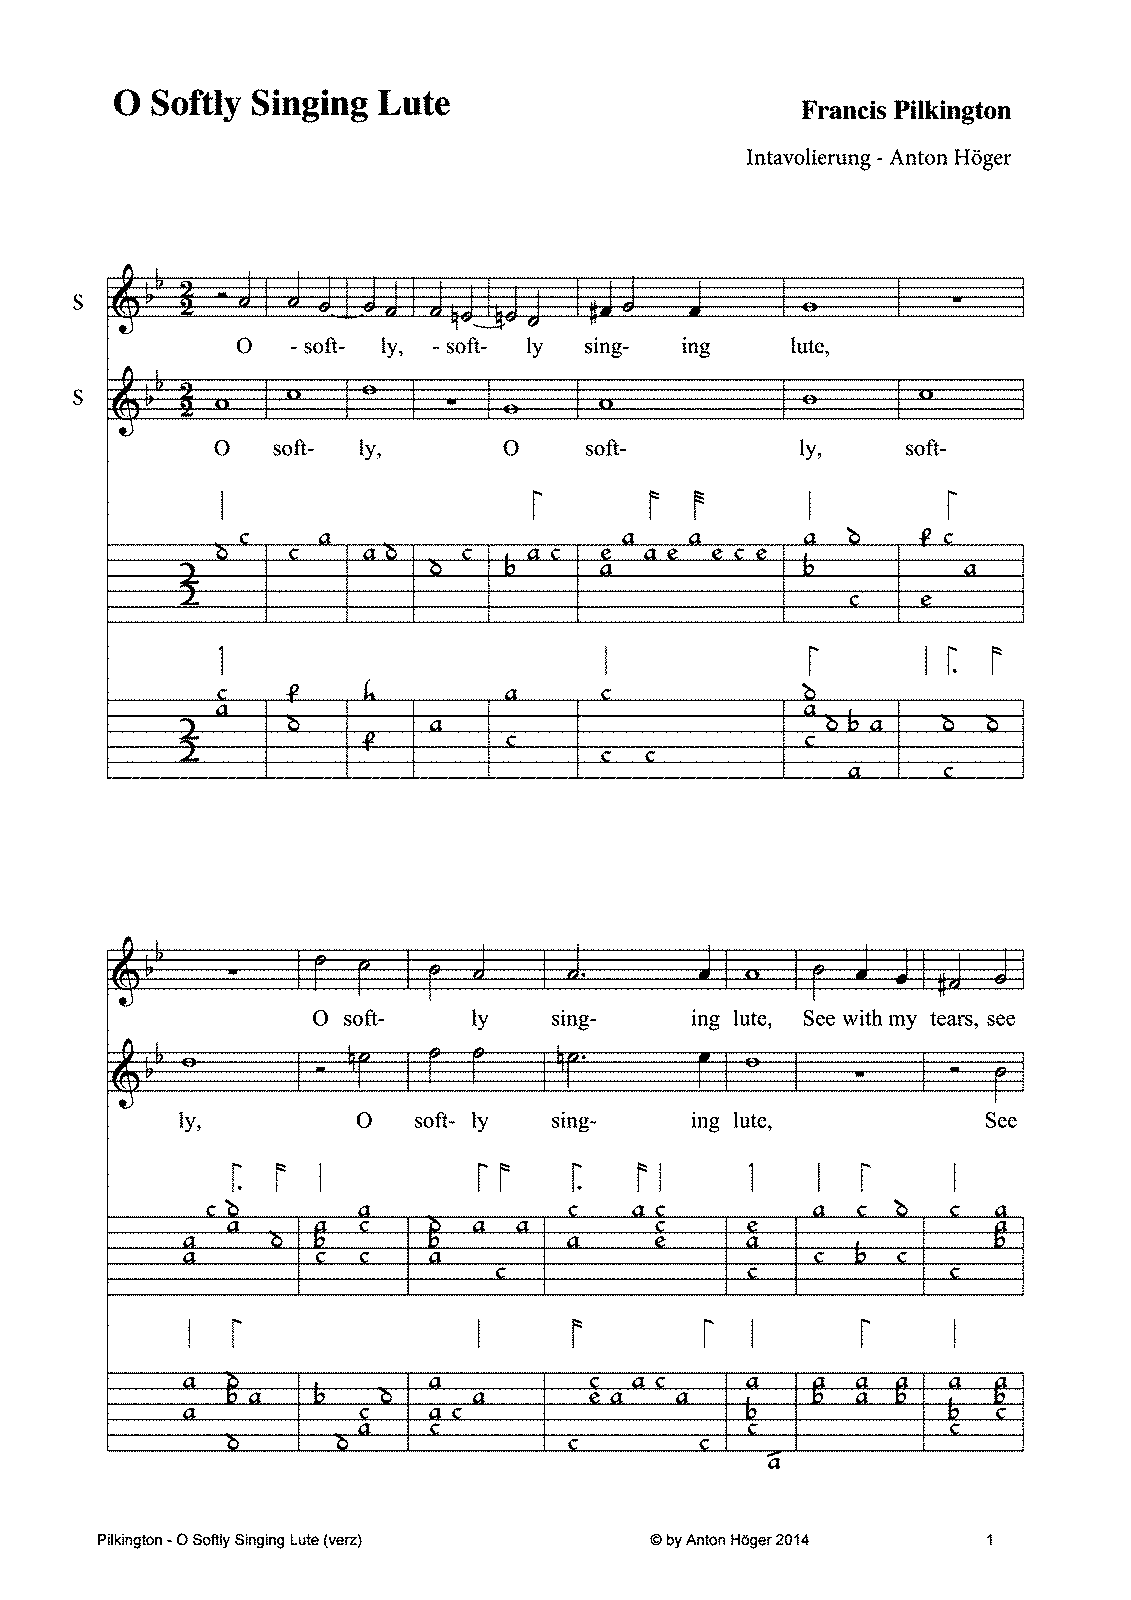 O Softly Singing Lute Pilkington Francis